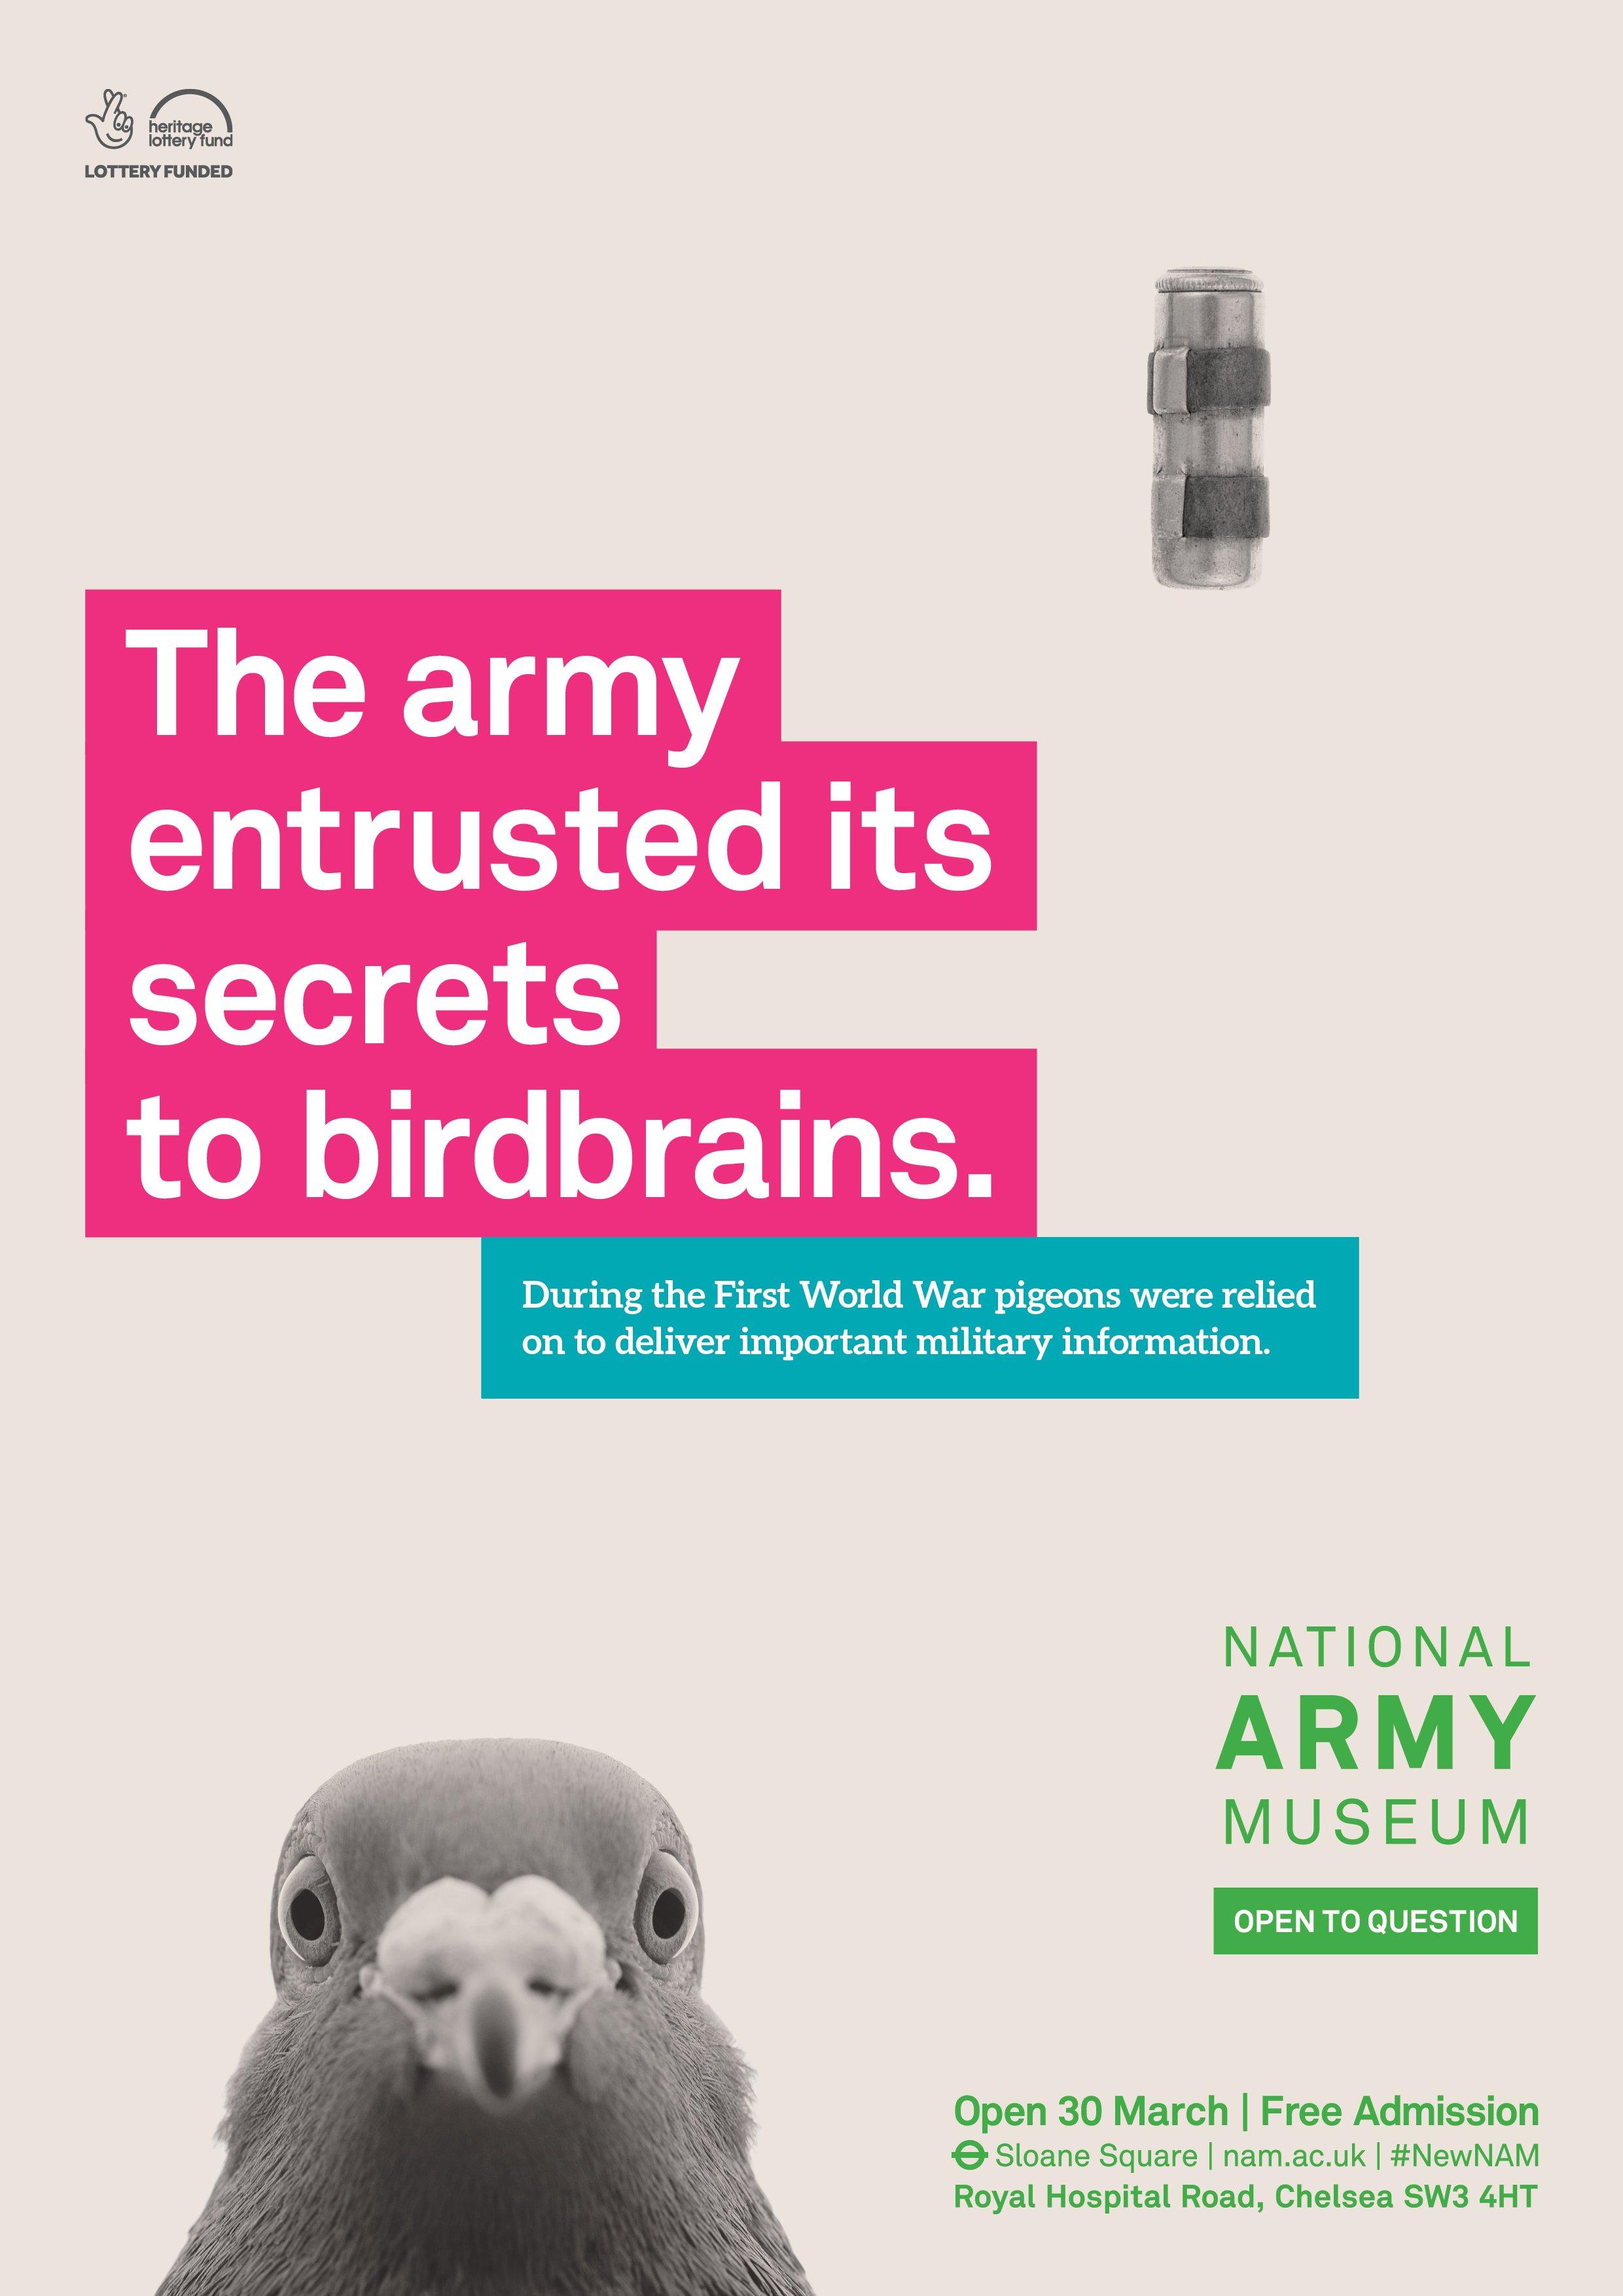 national-army-museum-birdbrain-2000-65822.jpg